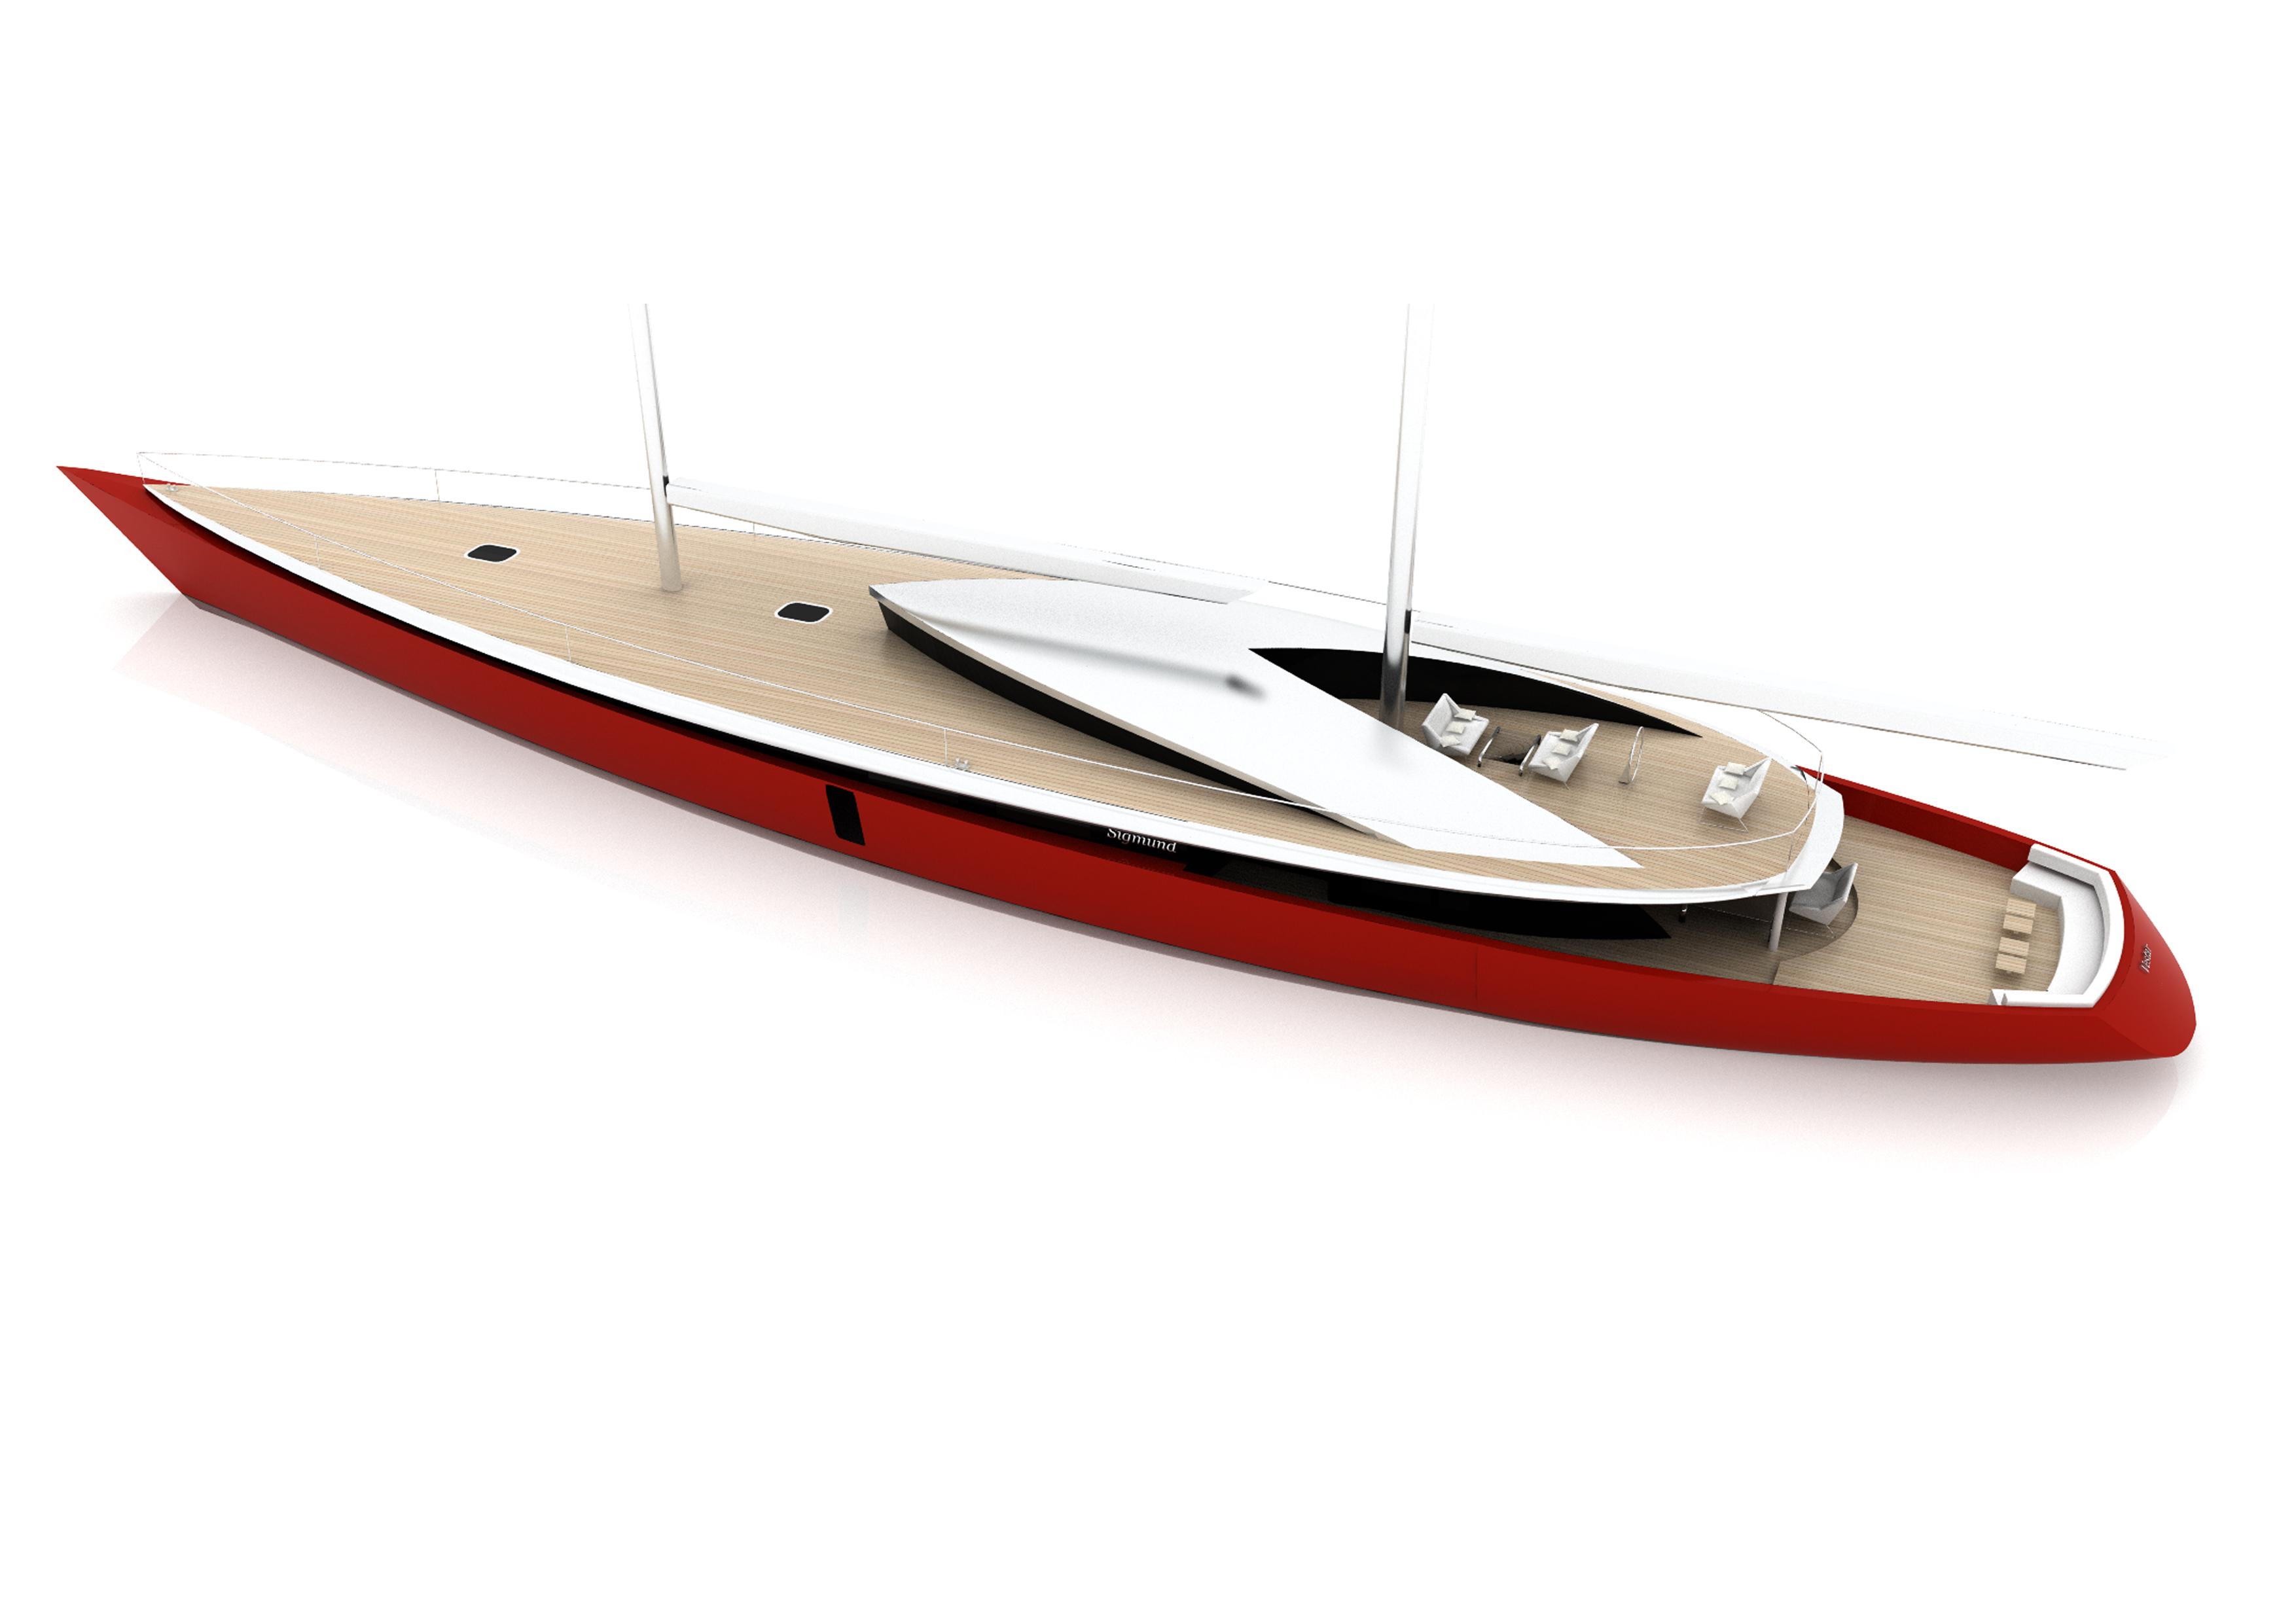 60m Vestar yacht concept by Sigmund Yacht Design sailing yacht concept designs on boat wiring diagram